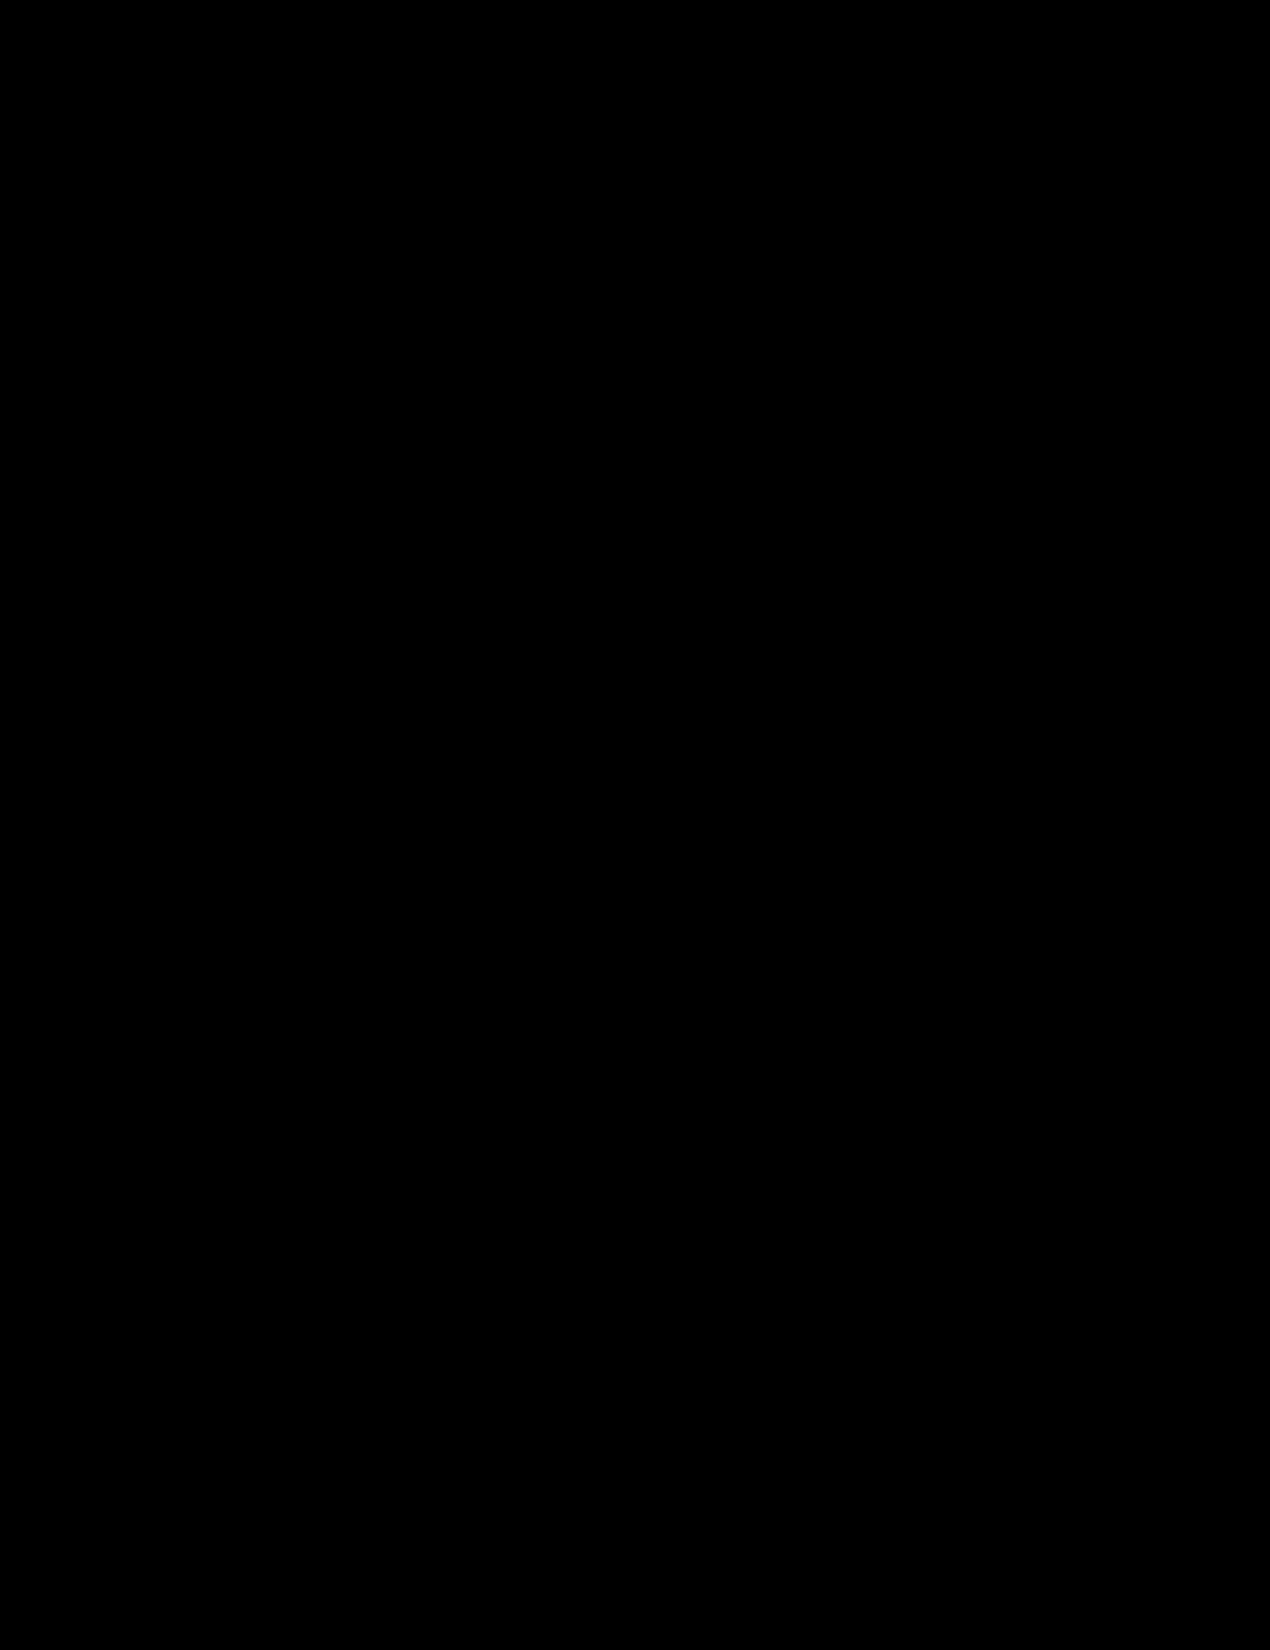 Array - vector calculus solution manual  rh   g3vecurjv gq